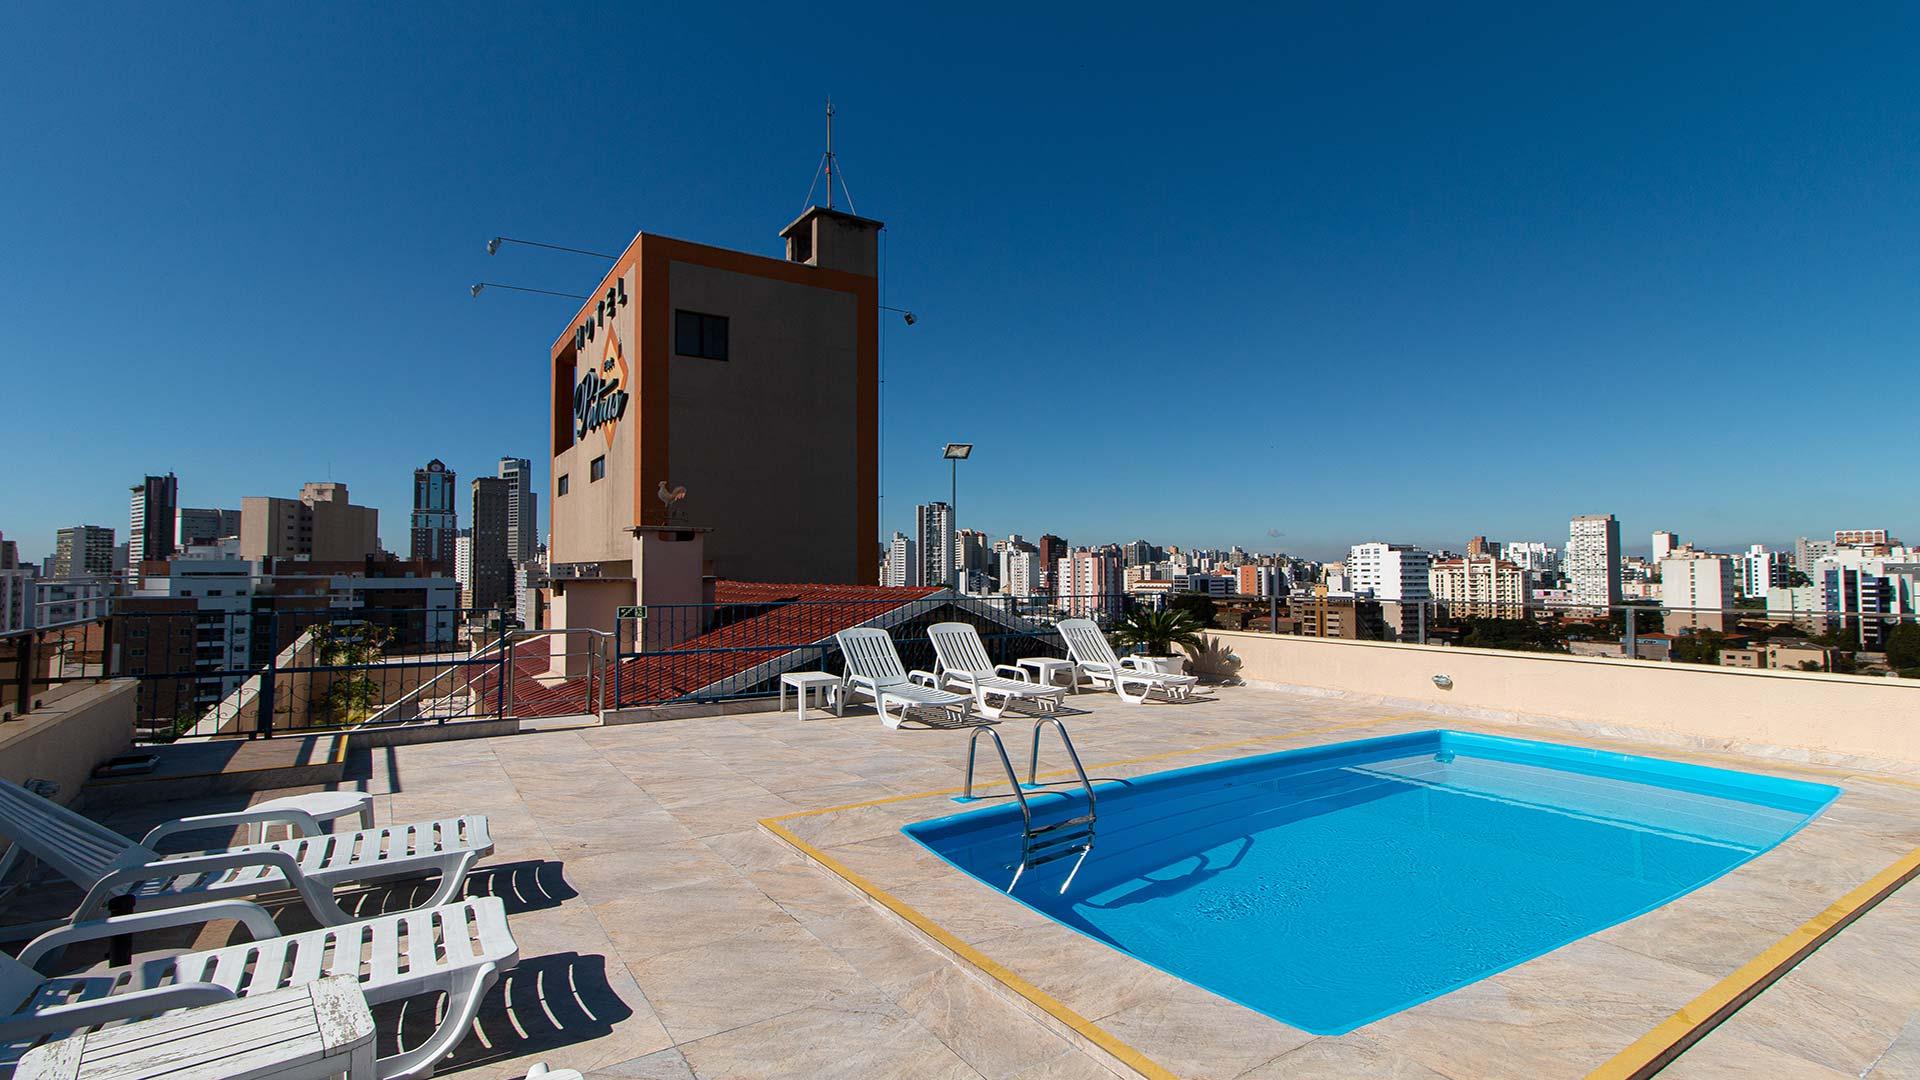 Flat Petras Curitiba hotel centro Curitiba 80 2